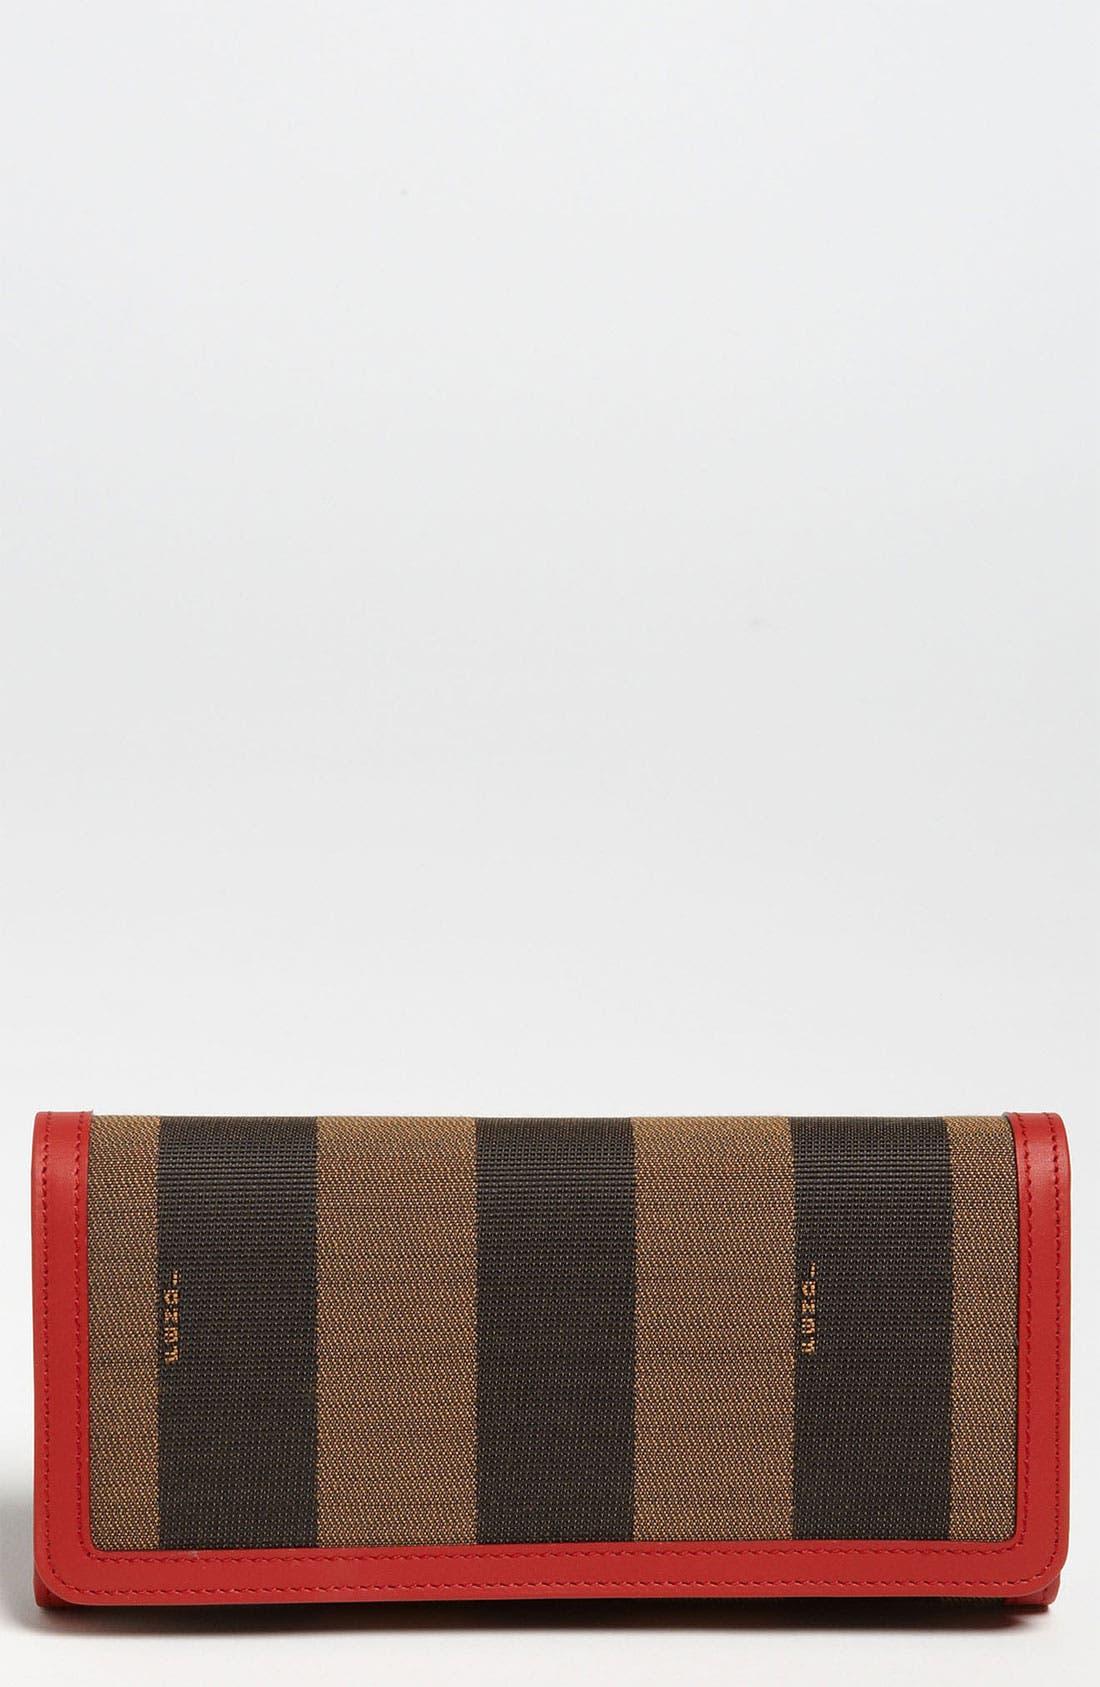 Main Image - Fendi 'Pequin' Continental Wallet